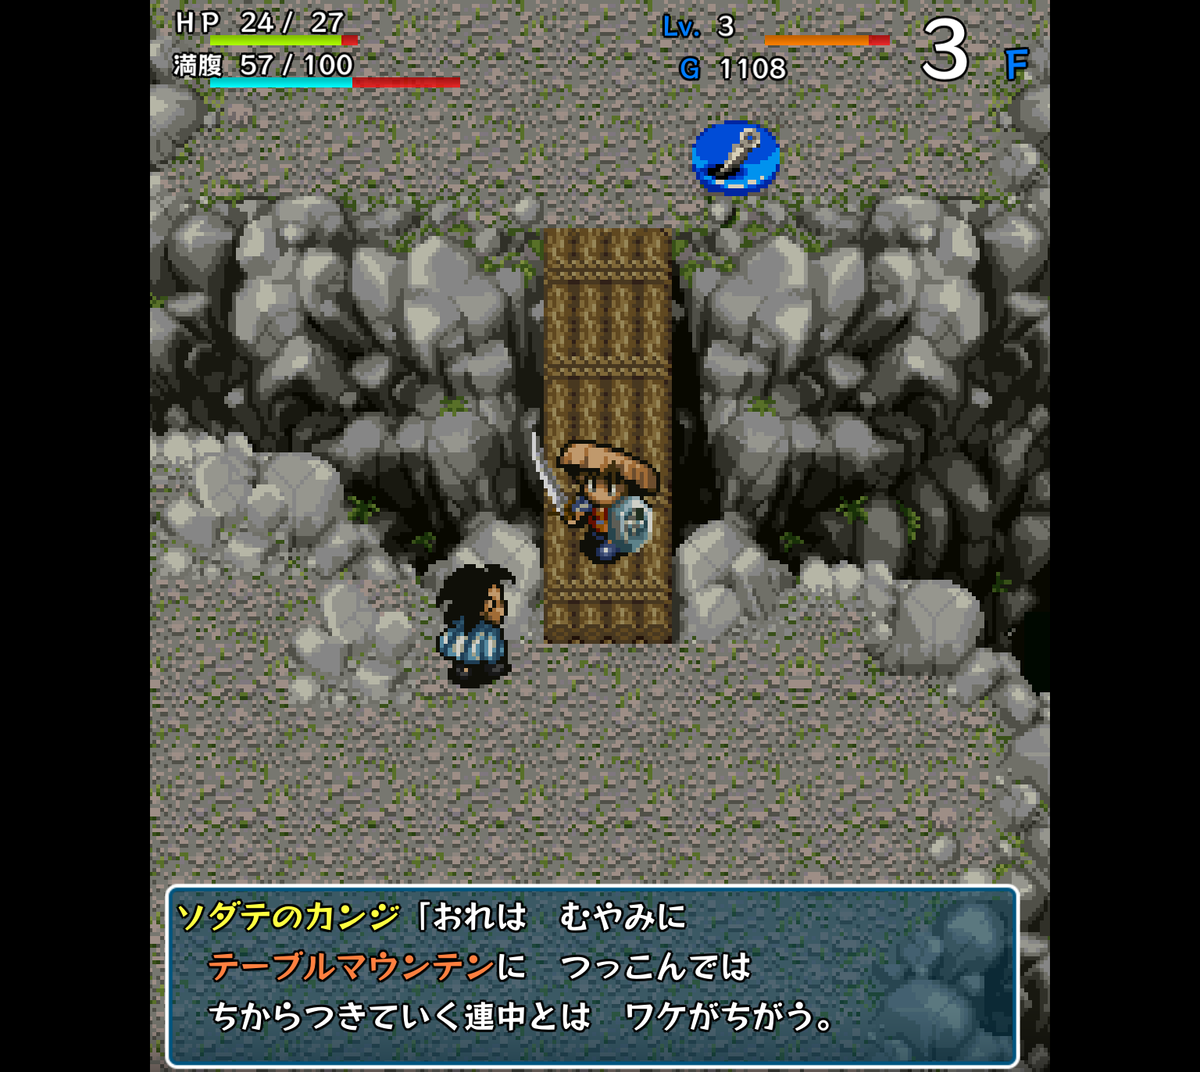 f:id:game-bakari:20190330185950p:plain